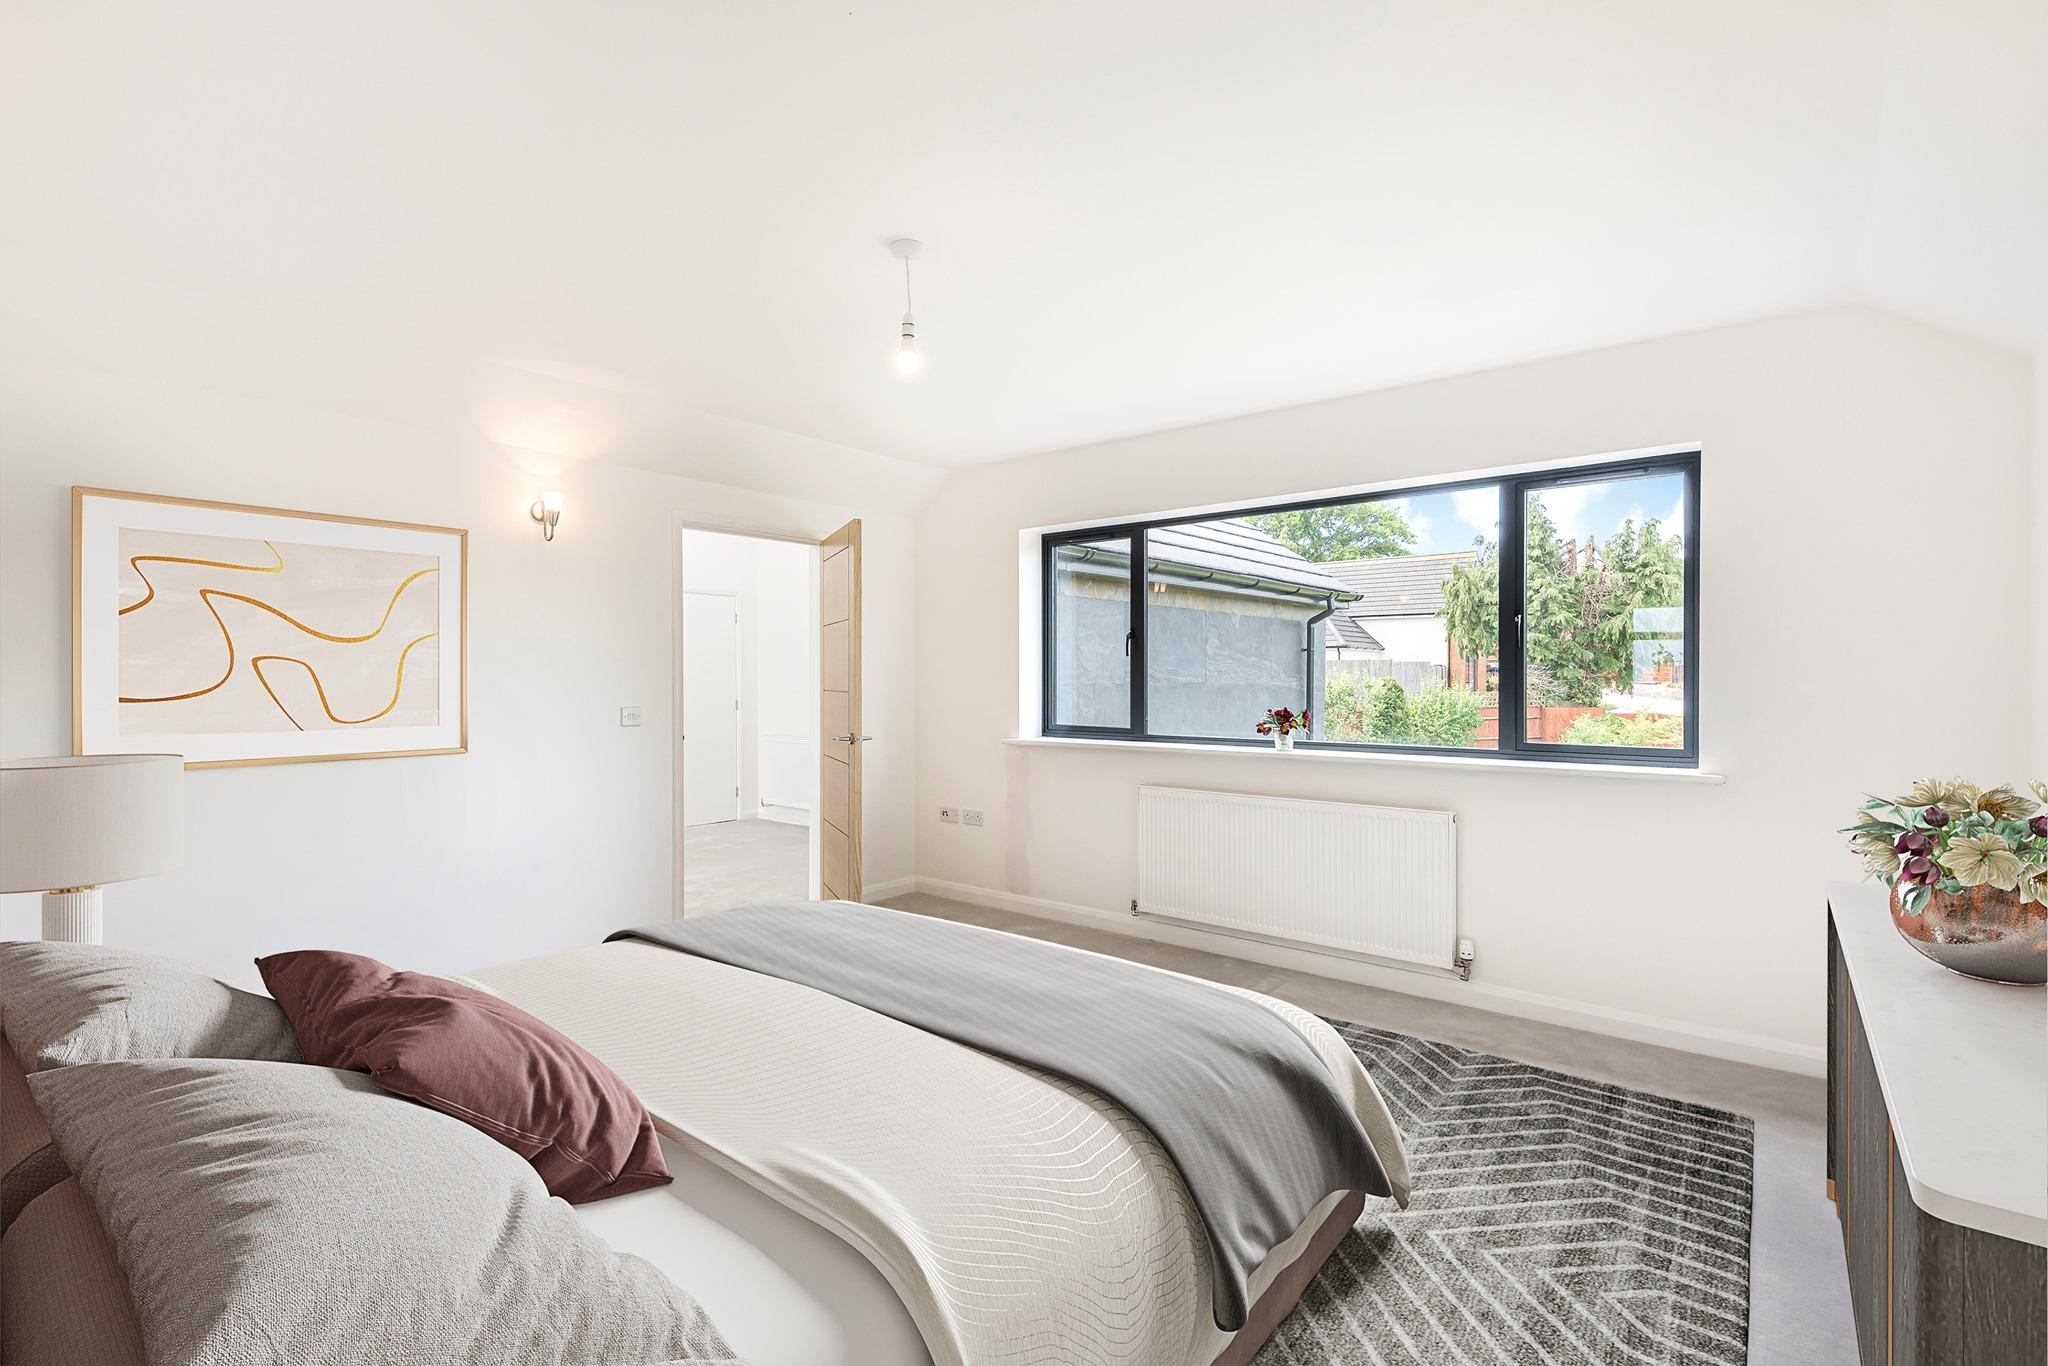 After - New Build House Development Project by Applecore PDM Burridge Hampshire